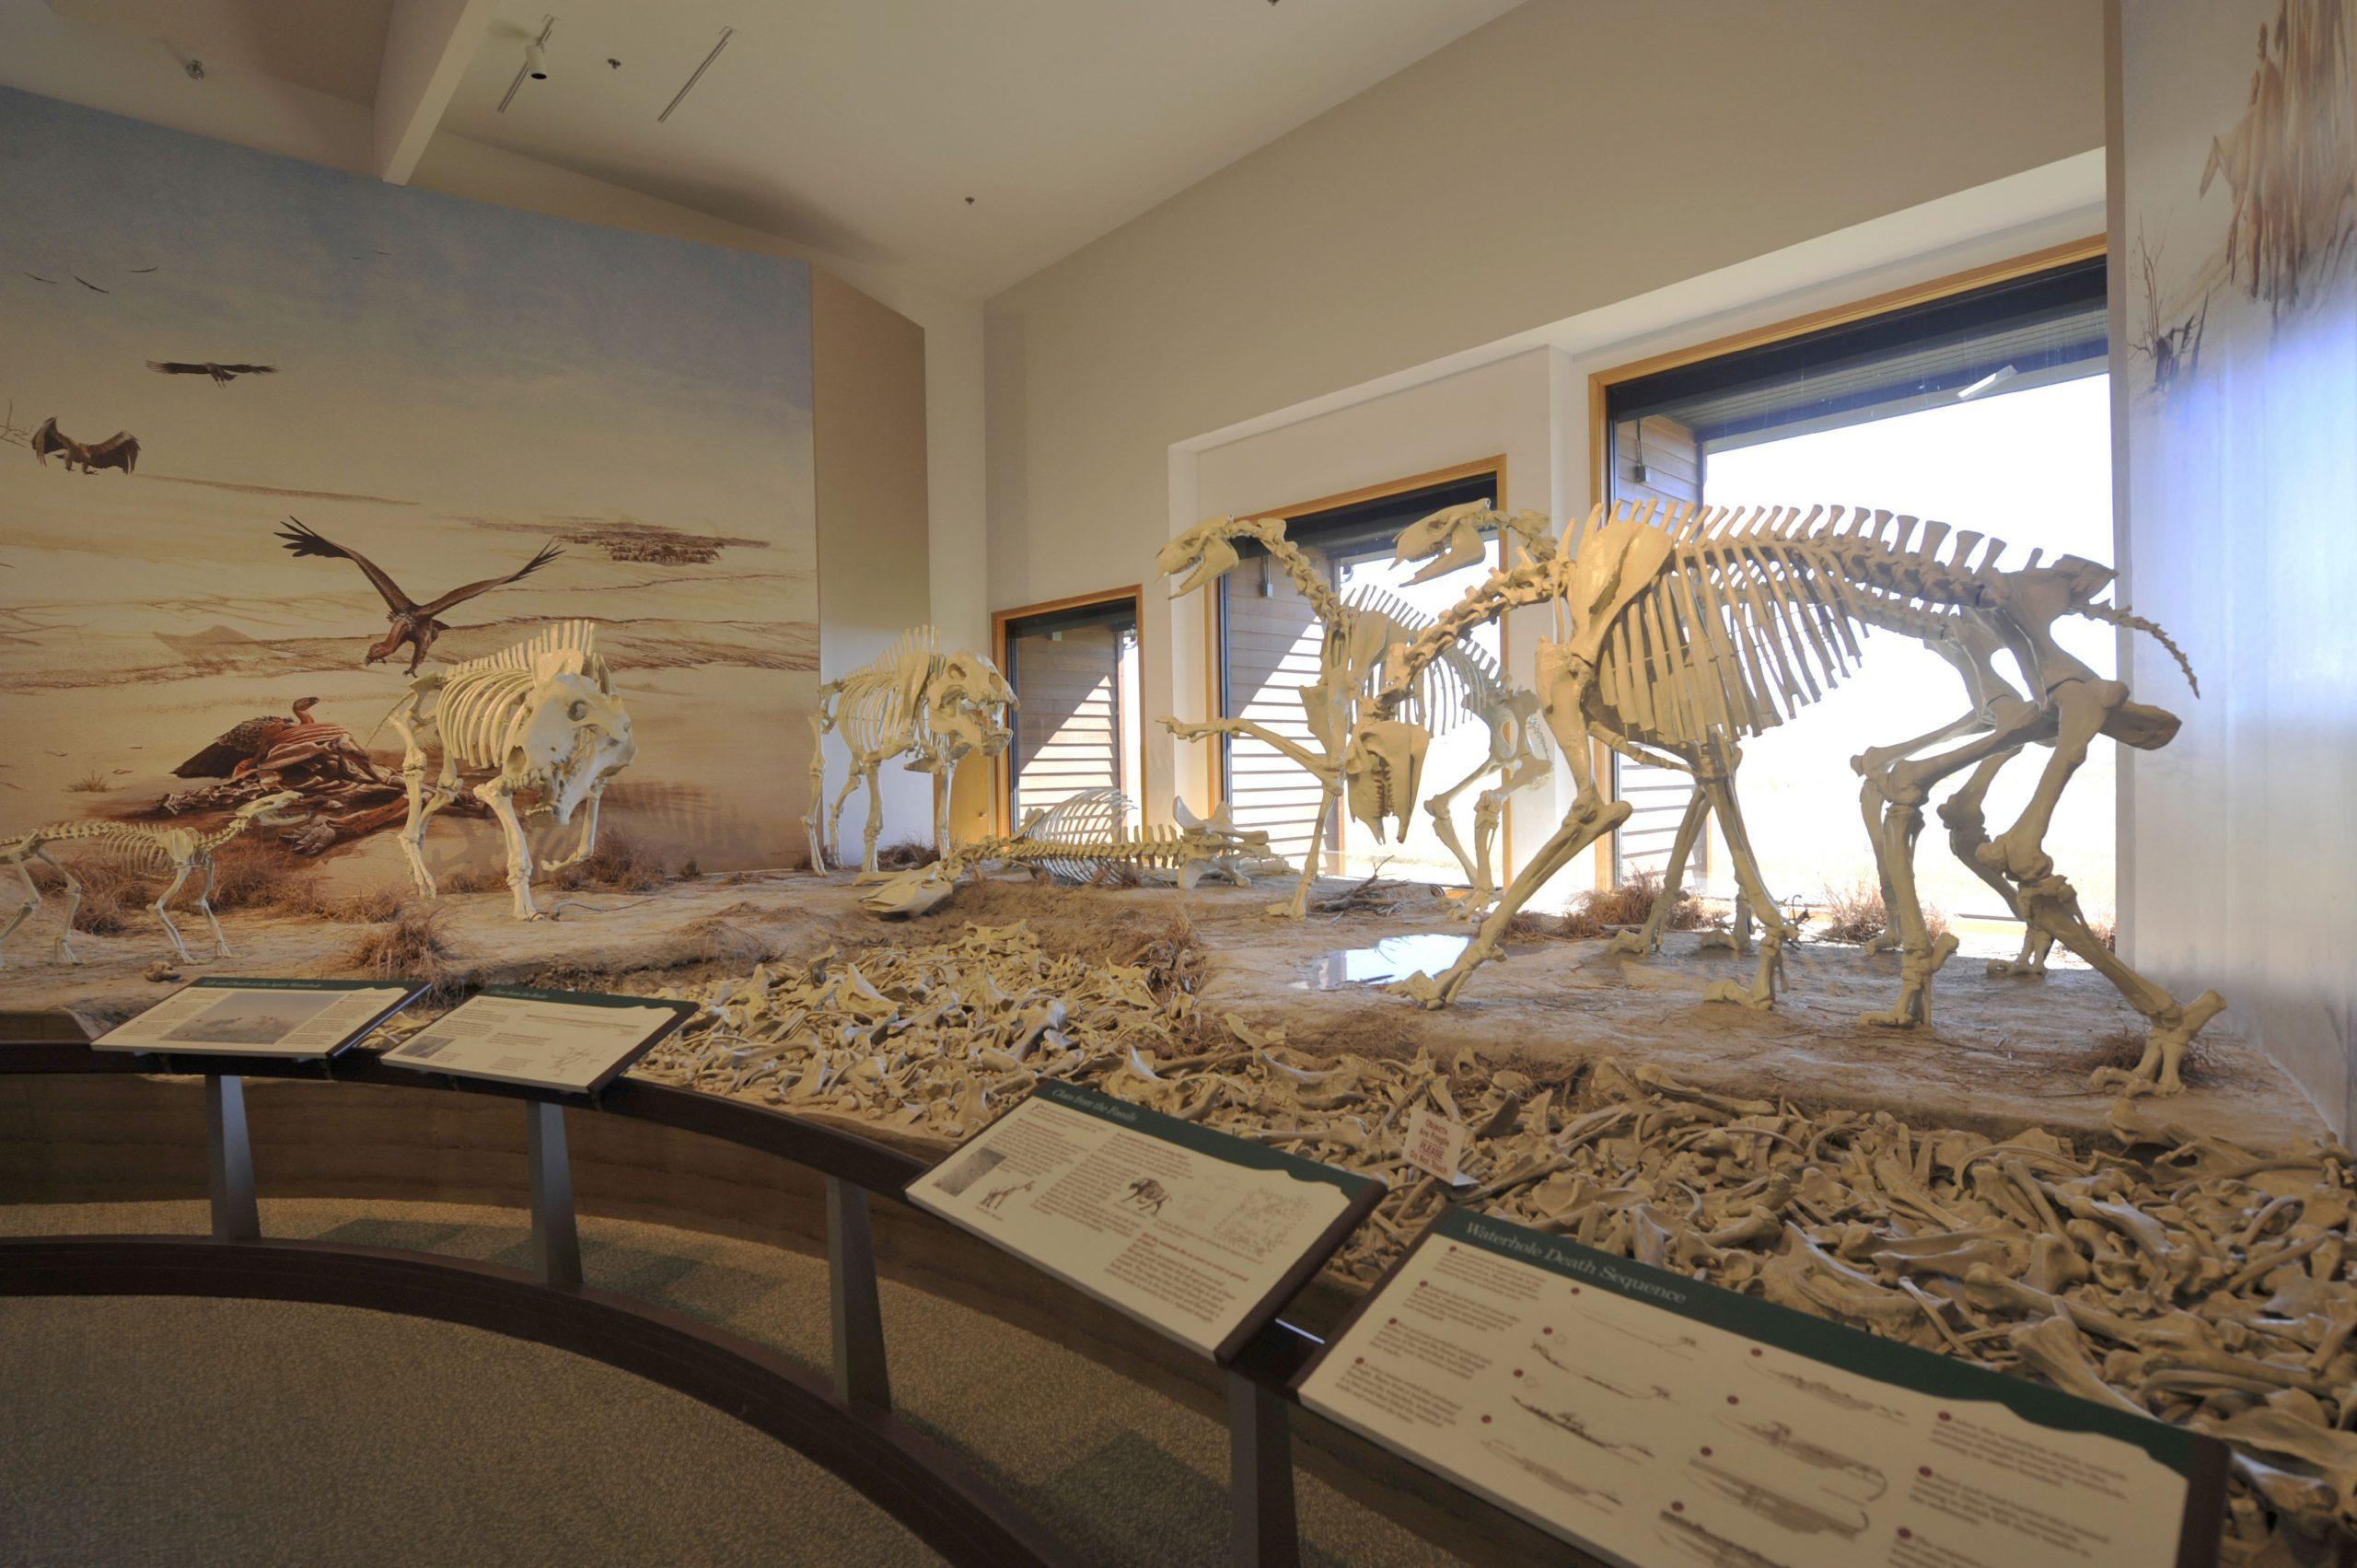 Nebraska, Agate Fossil Beds National Monument, Visitor Center, Fossil Exhibit